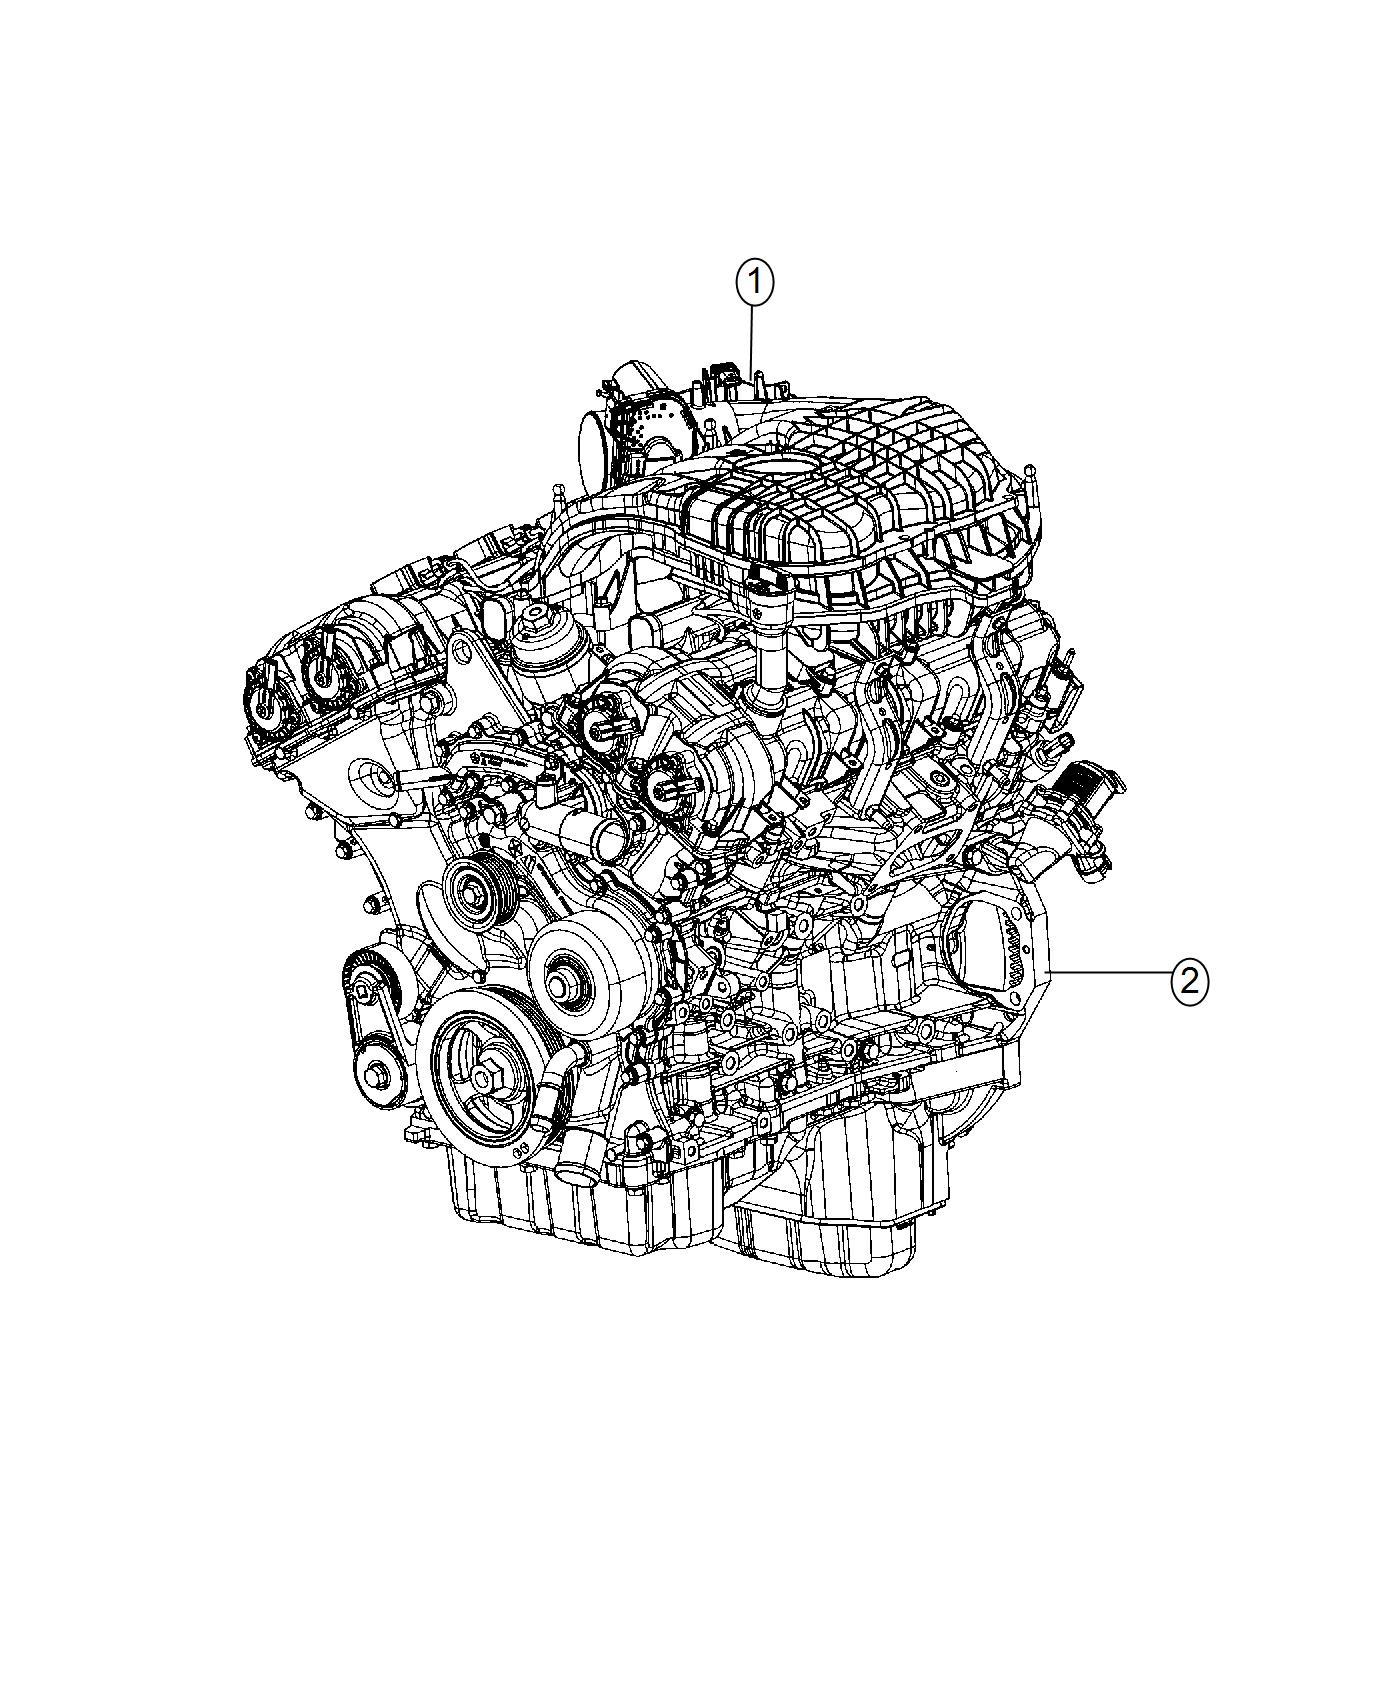 Chrysler 200 Engine Long Block Kit Cylinder